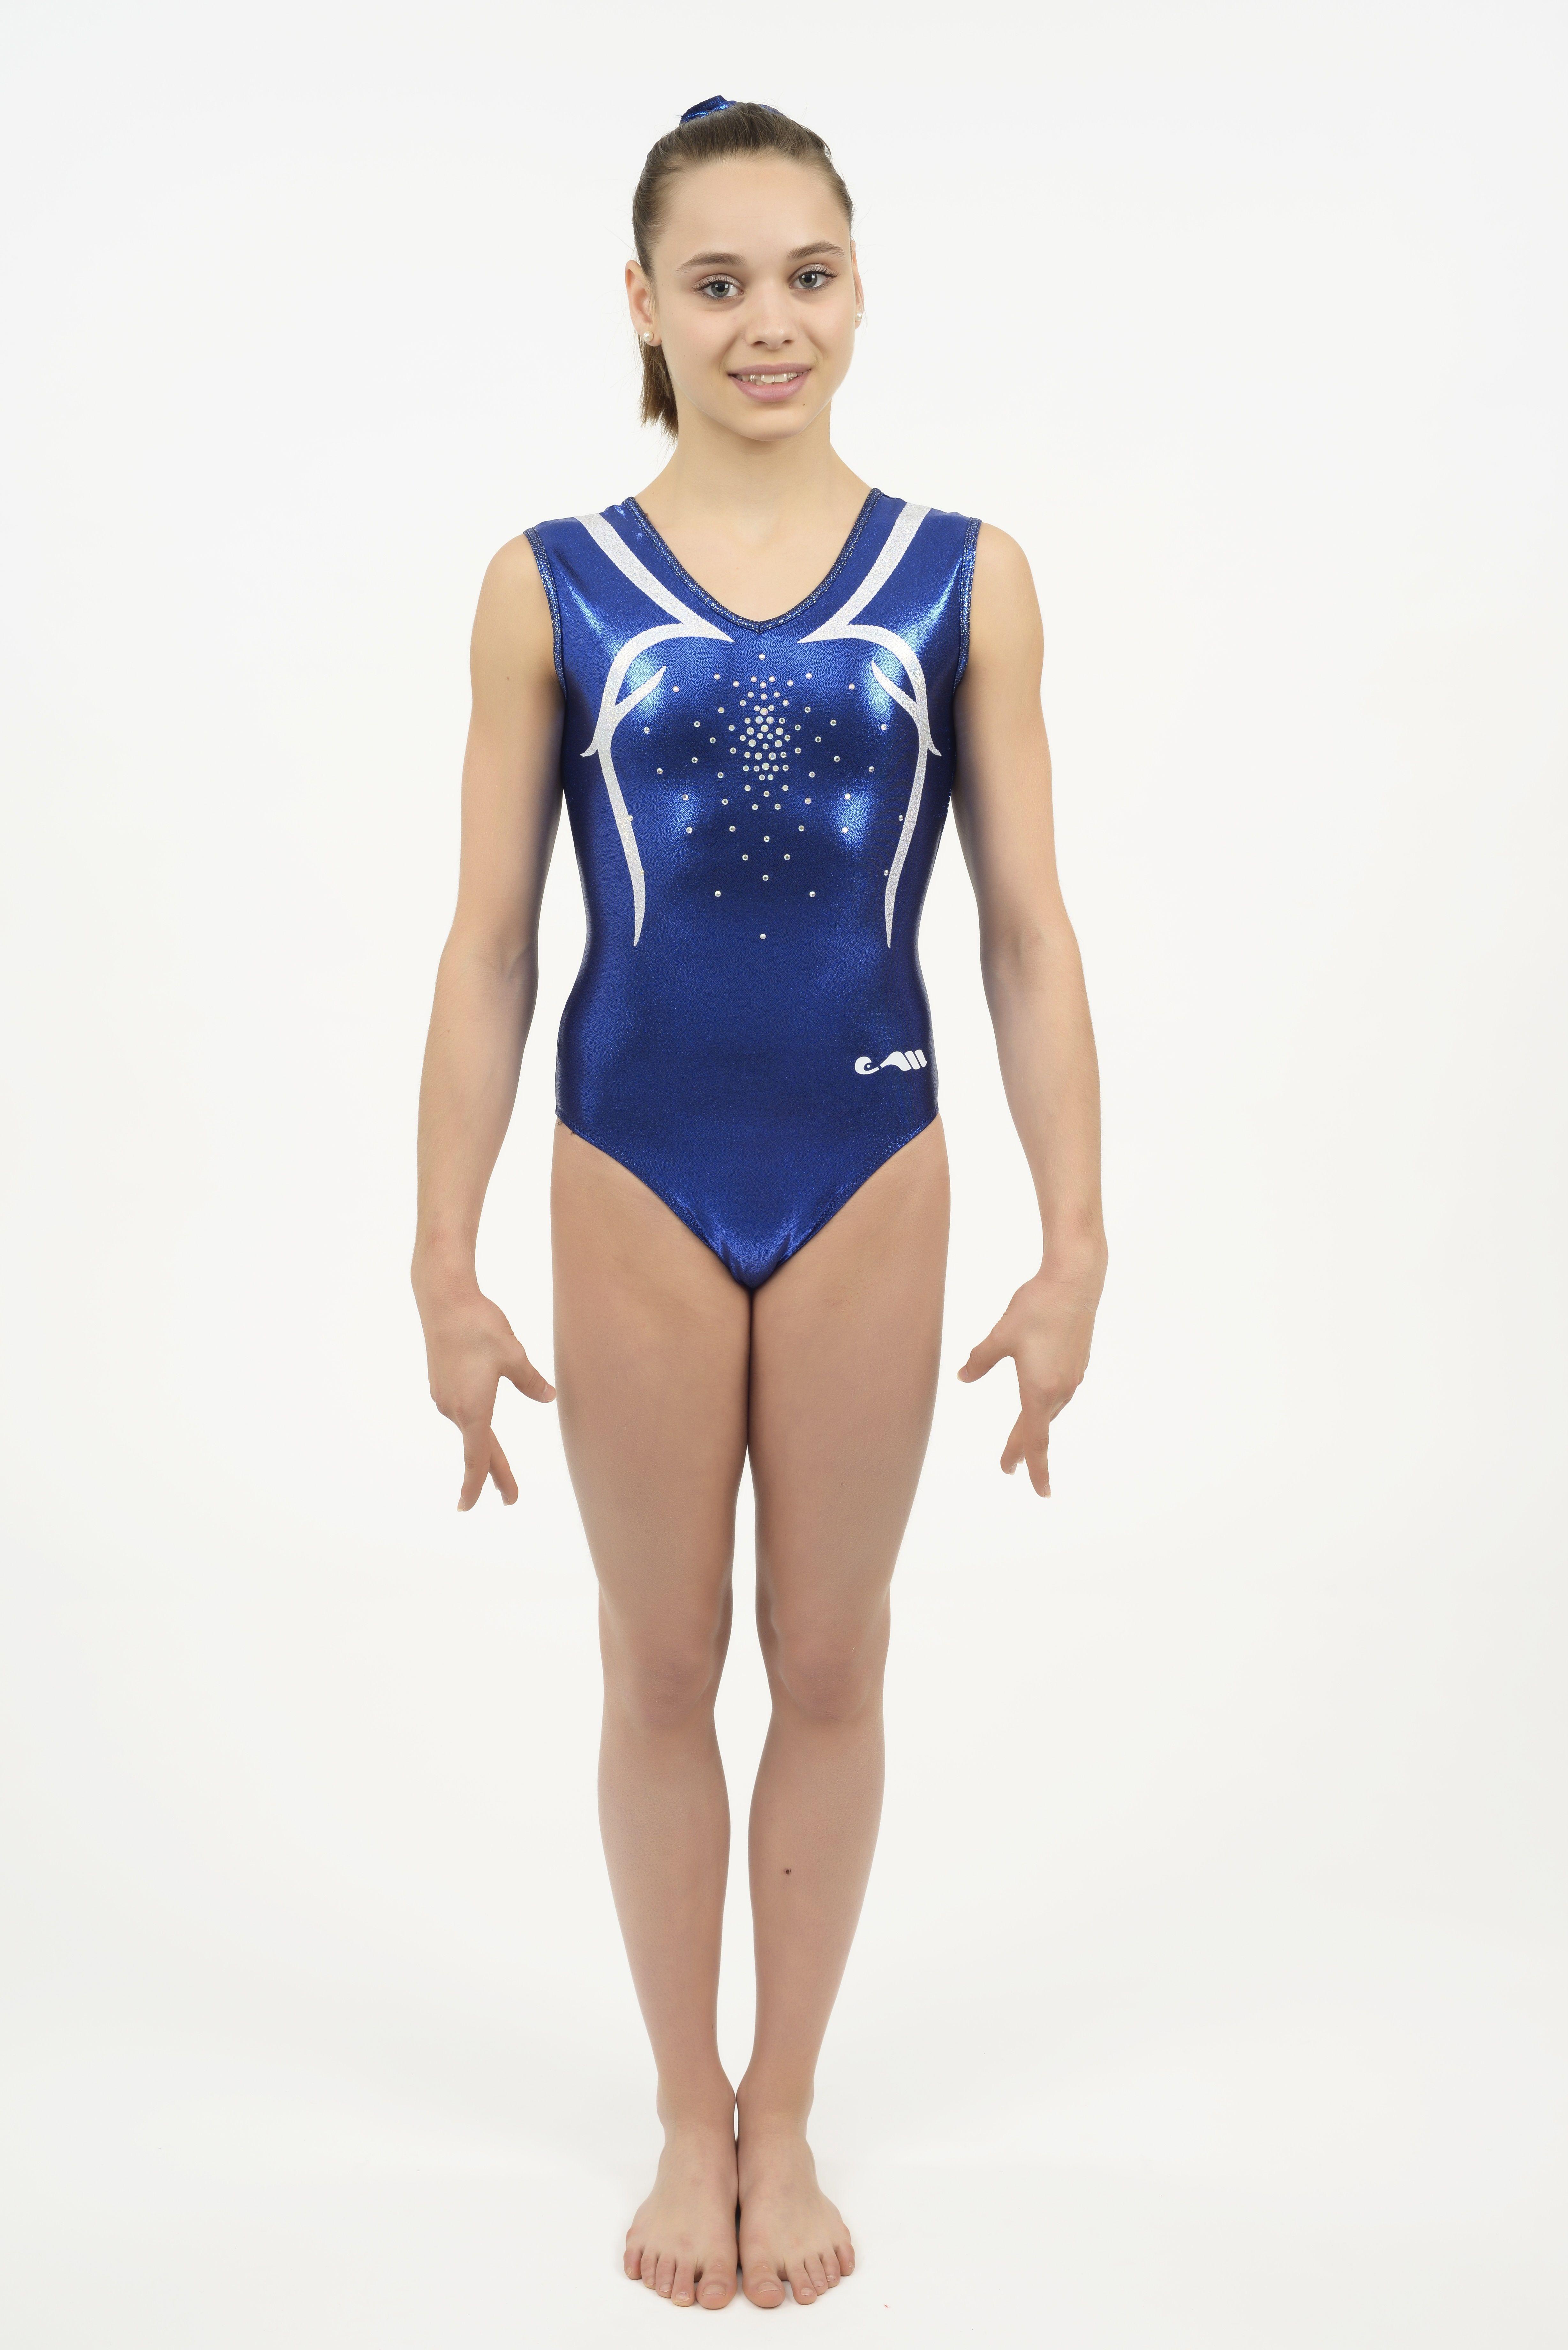 bcbf7c3f2e00 French gymnast Claire Martin